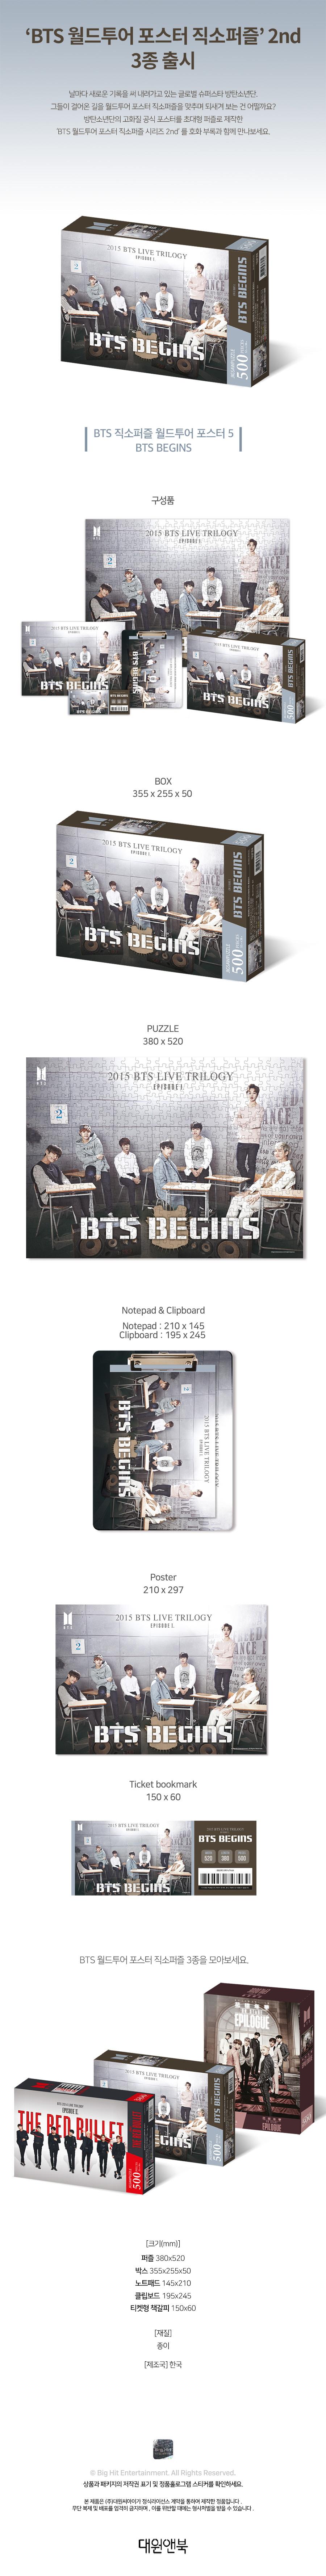 BTS 직소퍼즐 월드투어 포스터. 5: BTS Begins(인터넷전용상품) 도서 상세이미지